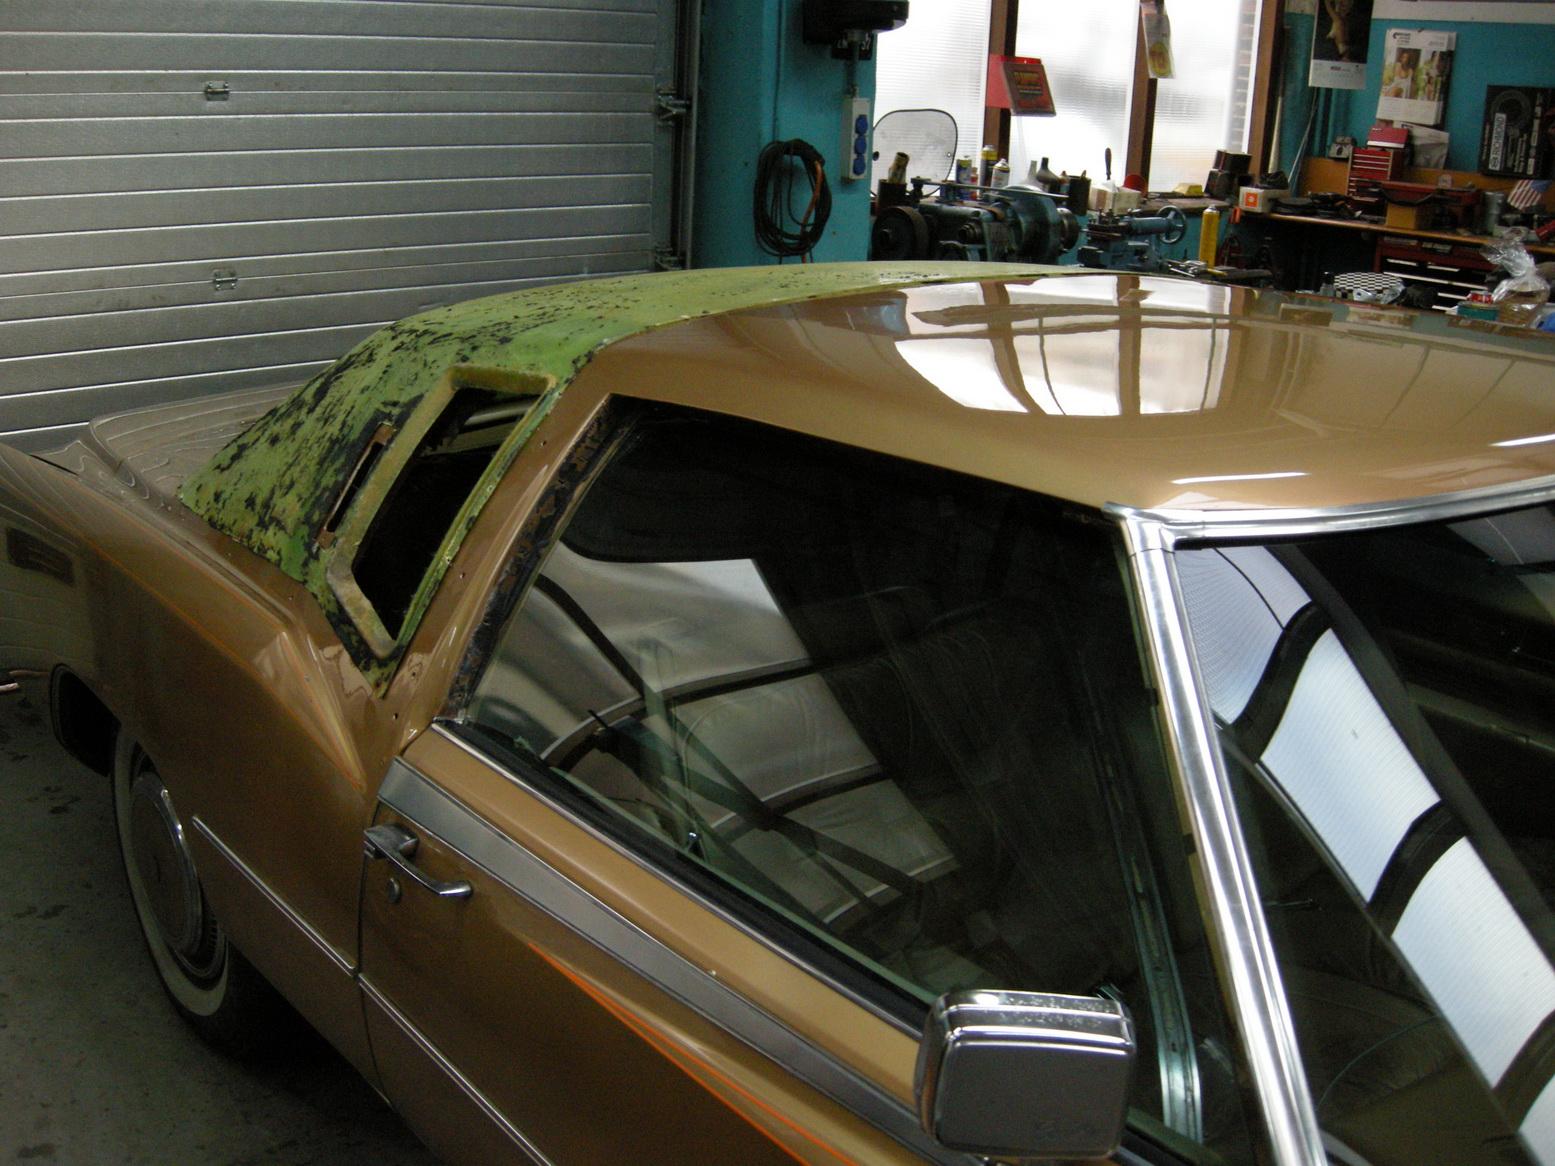 20101209 1977 cadillac eldorado biarritz roof nearly done 09